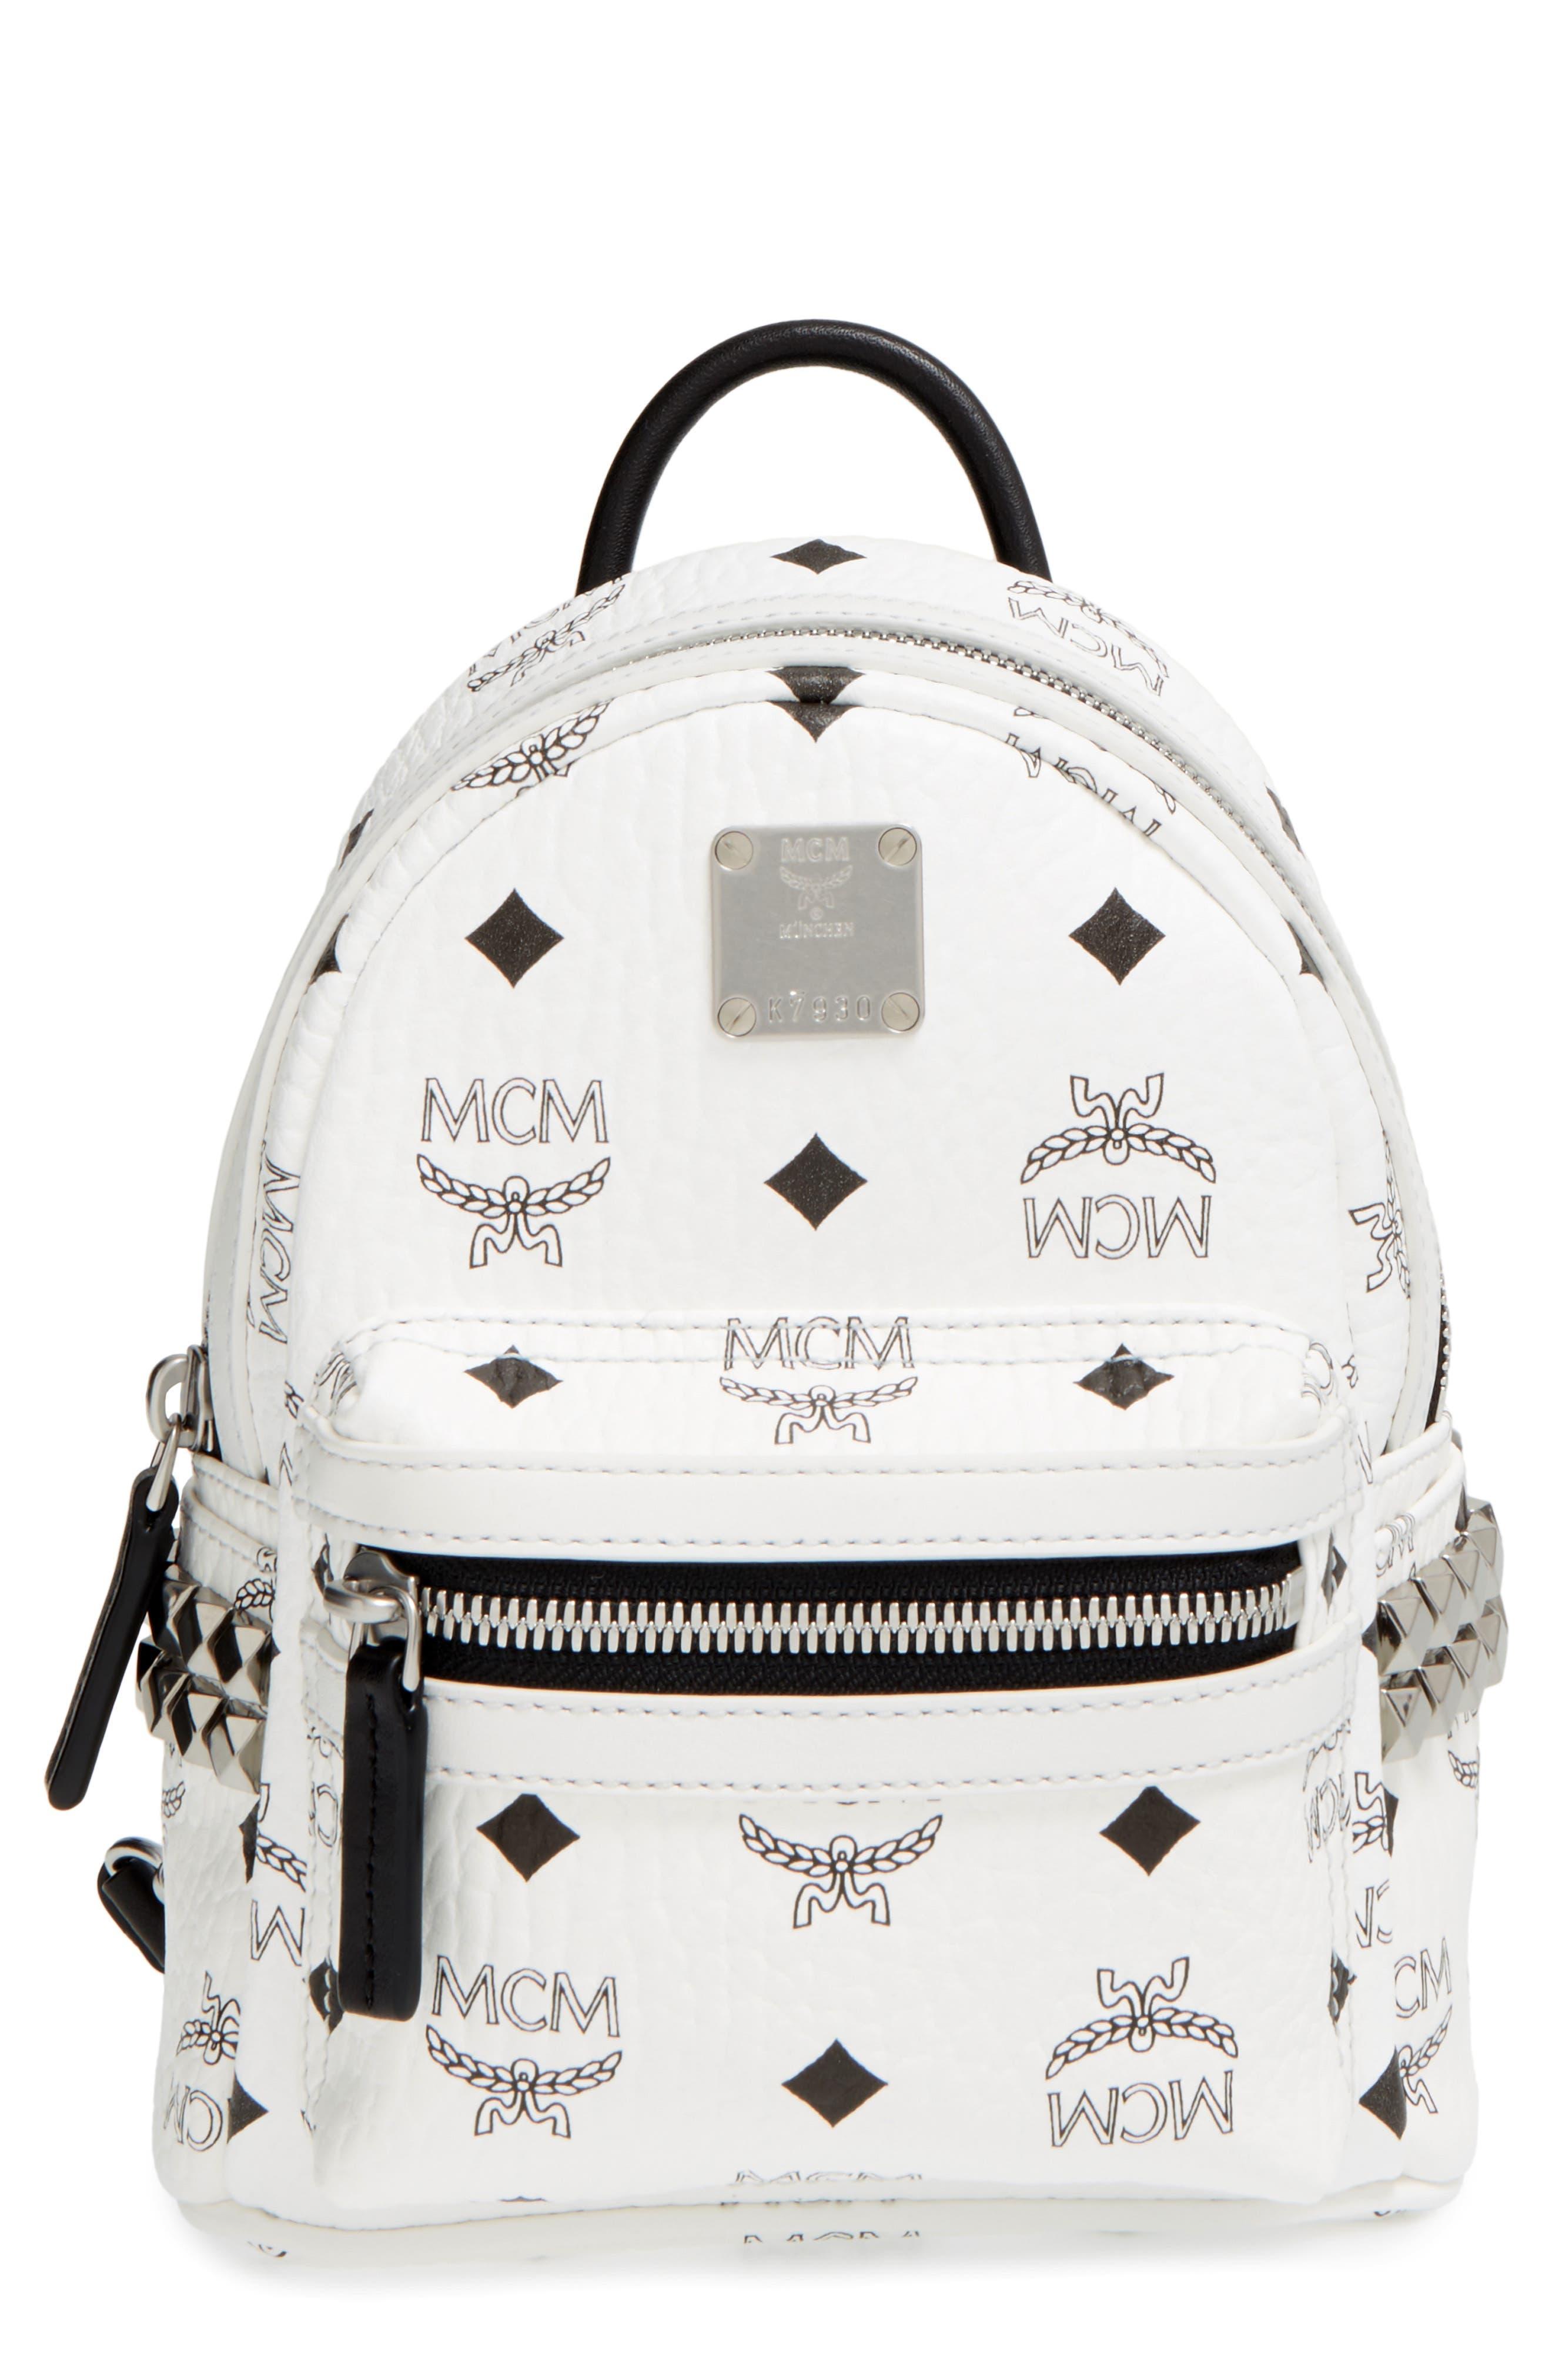 'X-Mini Stark Side Stud' Convertible Backpack, Main, color, WHITE